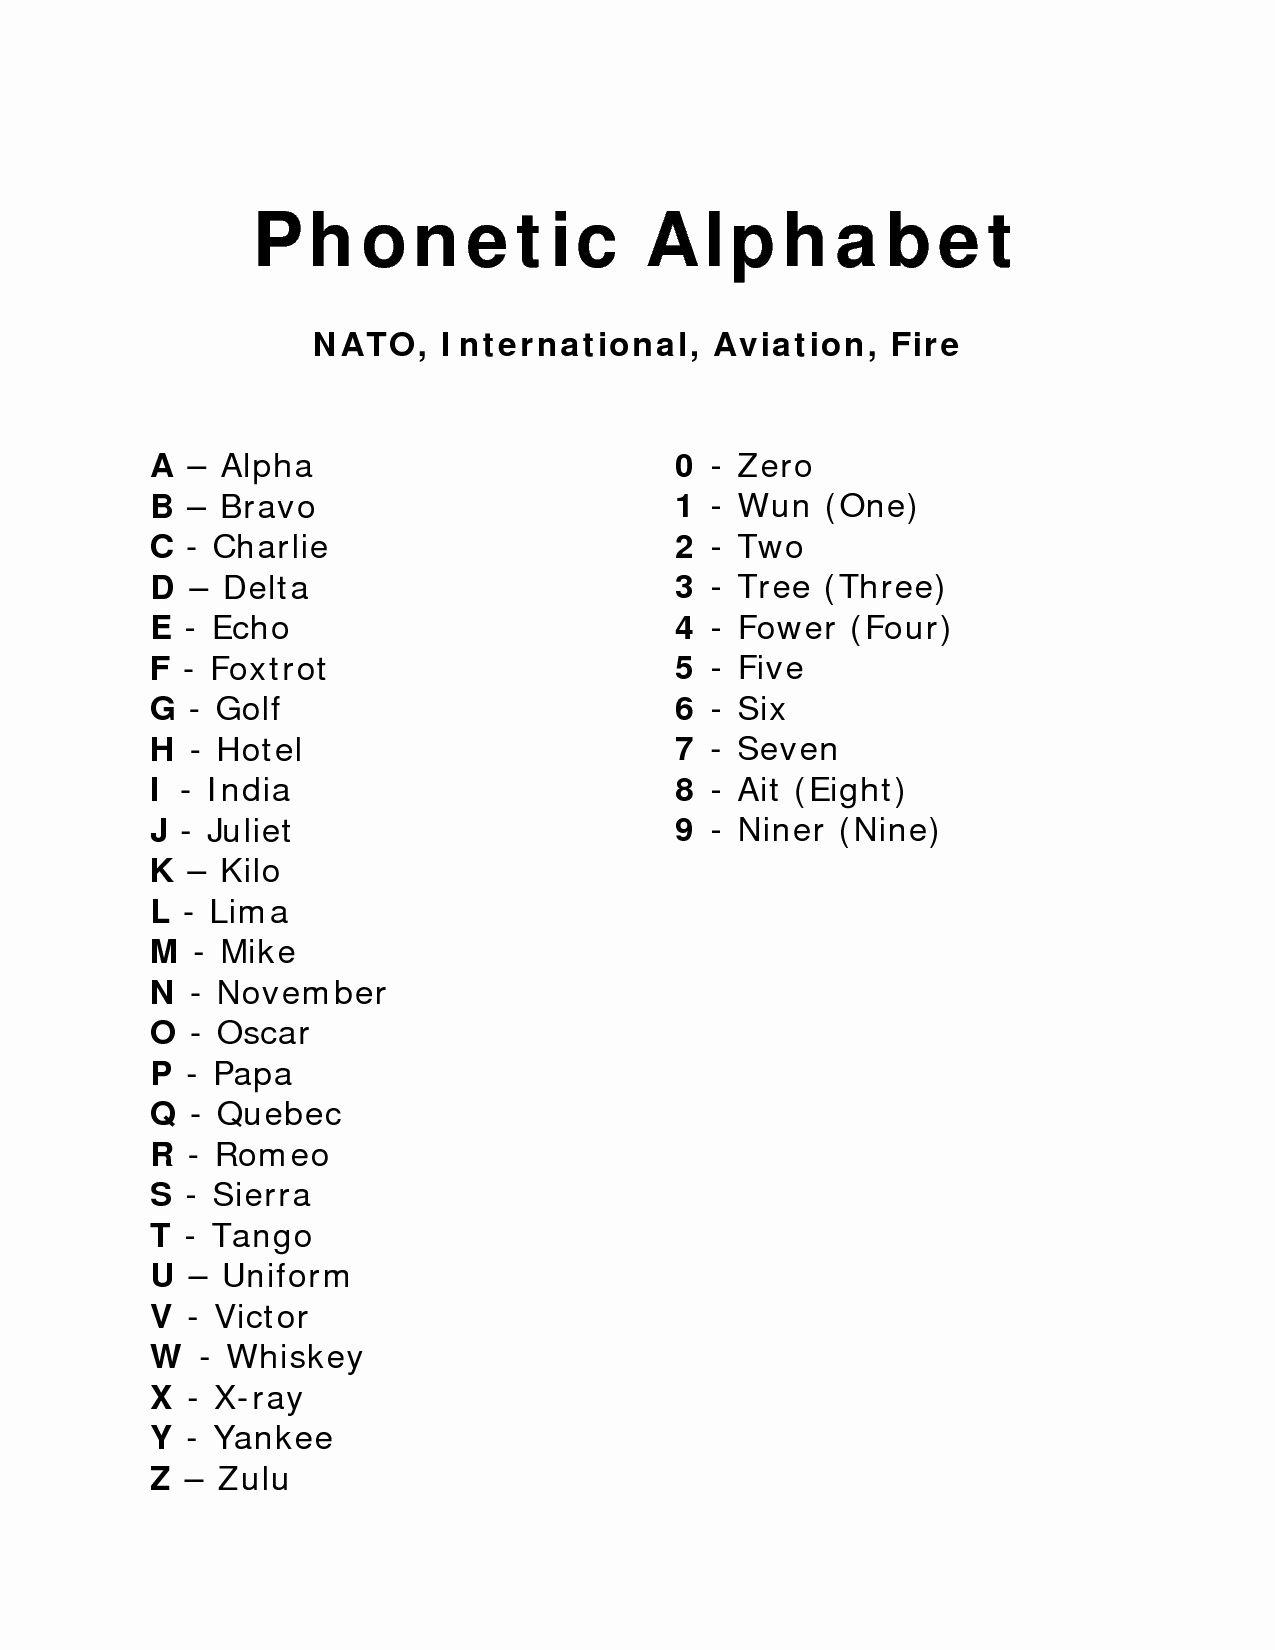 Alphabet Drawing Book Pdf Luxury Pin By 4khd On Nato Phonetic Alphabet Pdf Phonetic Alphabet Printable Chart Alphabet Charts [ 1650 x 1275 Pixel ]